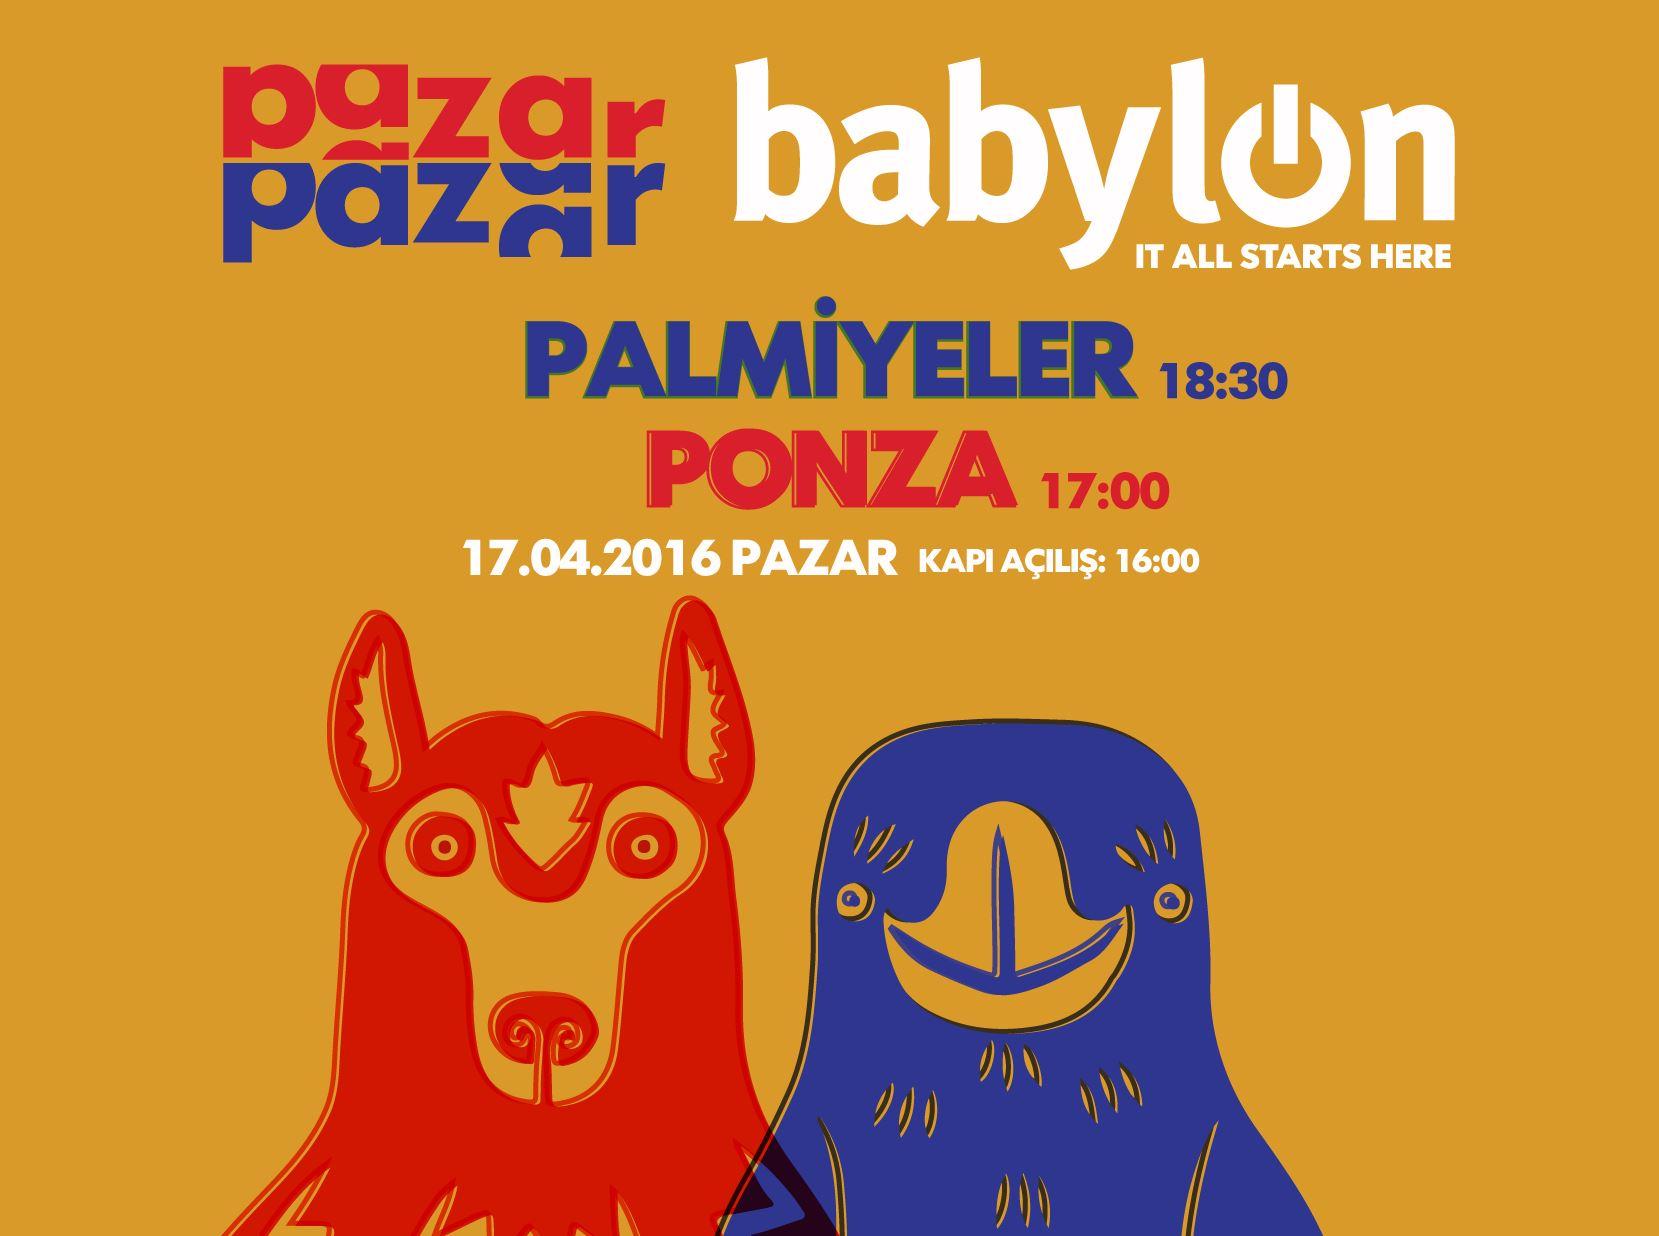 Pazar Pazar Babylon: Palmiyeler & Ponza